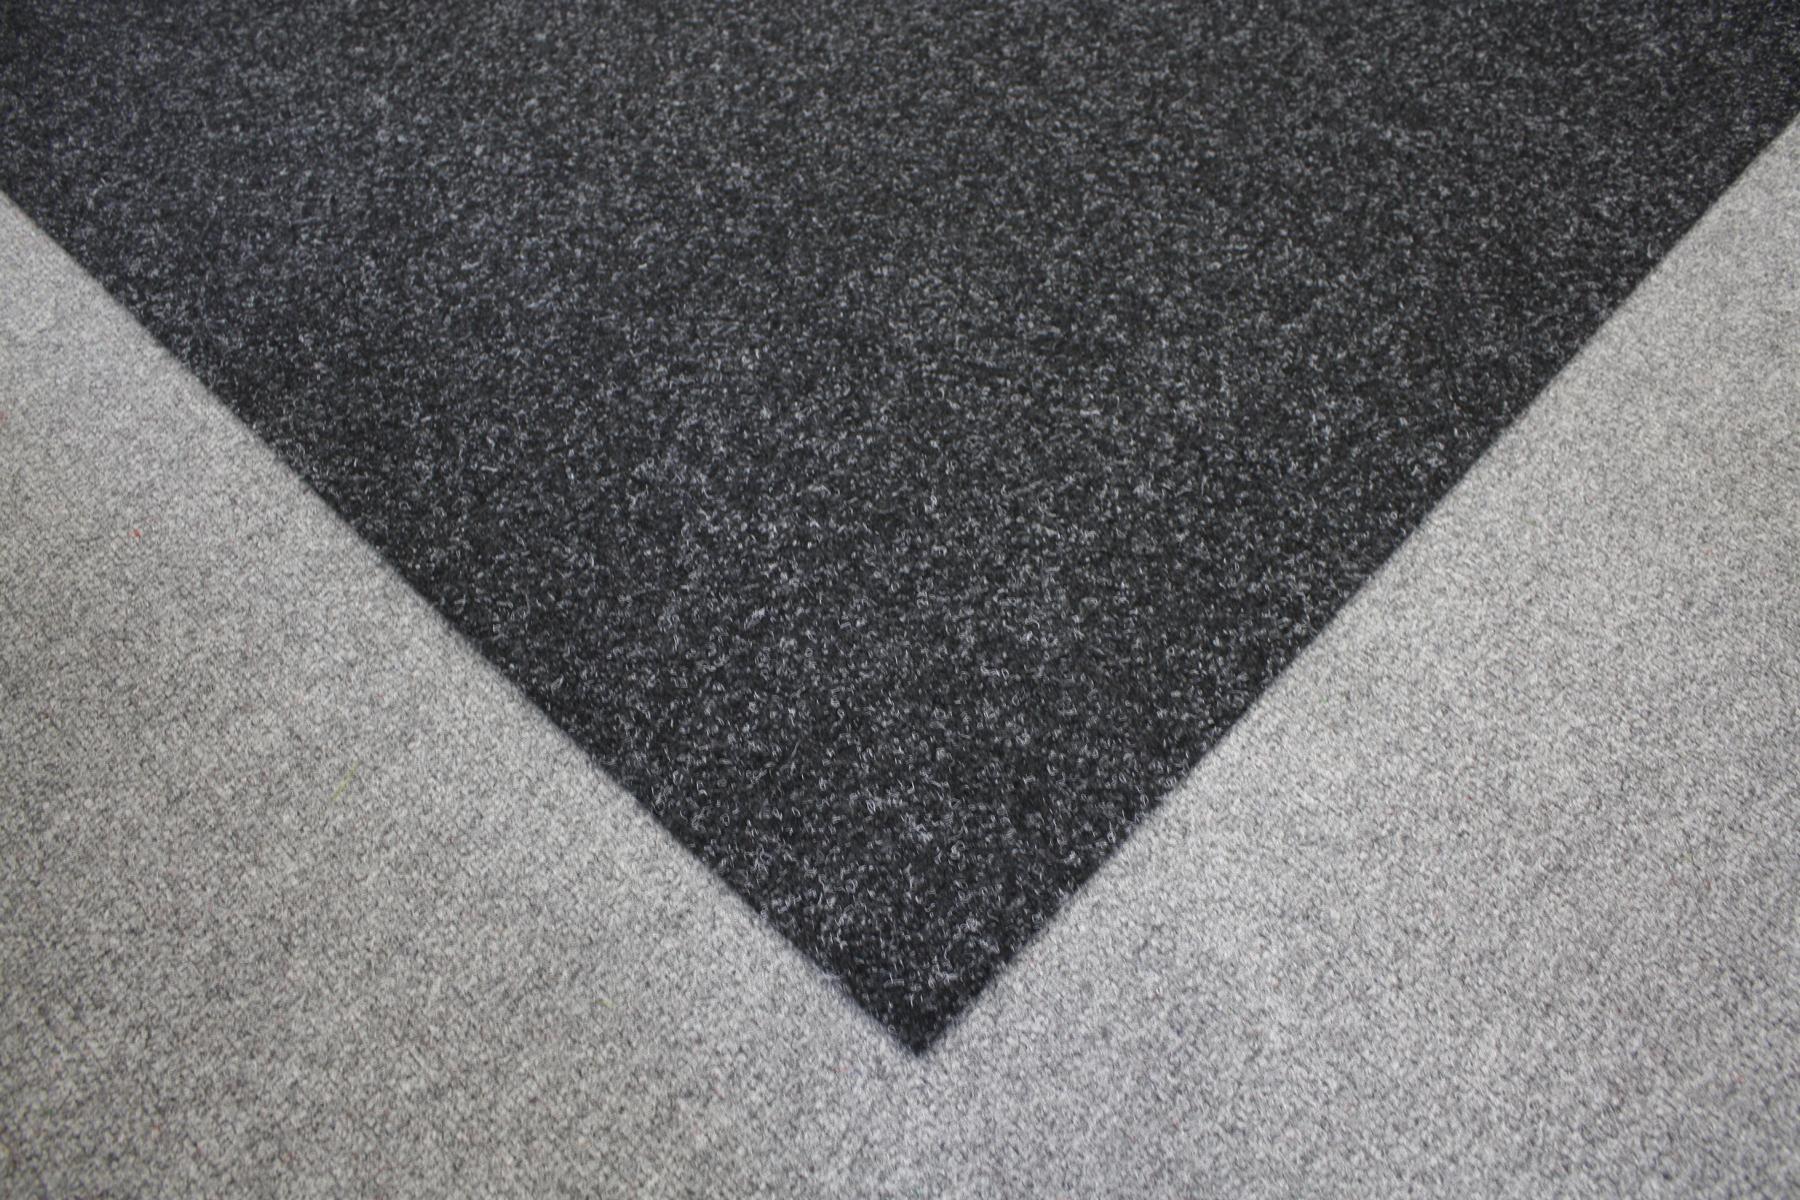 Pavimento tappeto geotessile non tessuto ago feltro merlin - Tappeto riscaldamento pavimento ...